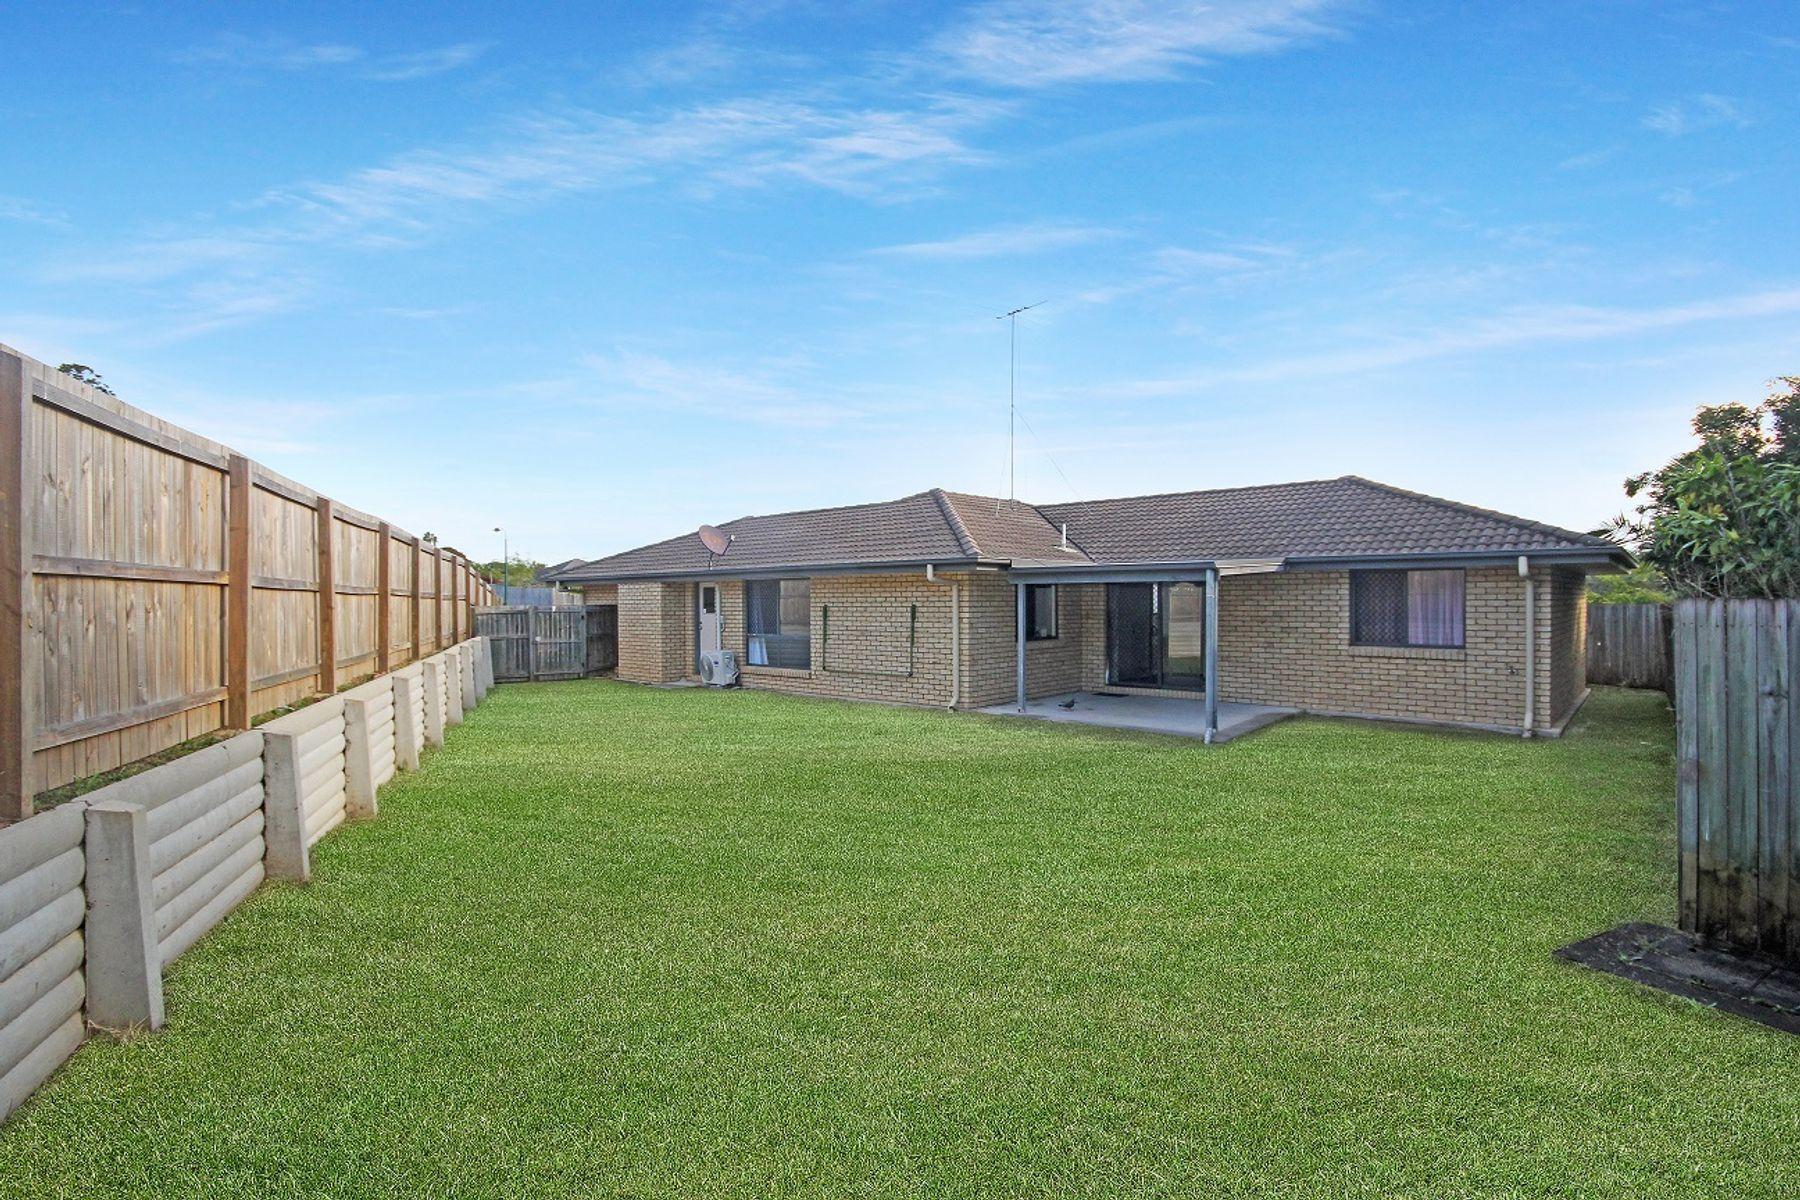 36 Storr Circuit, Goodna, QLD 4300